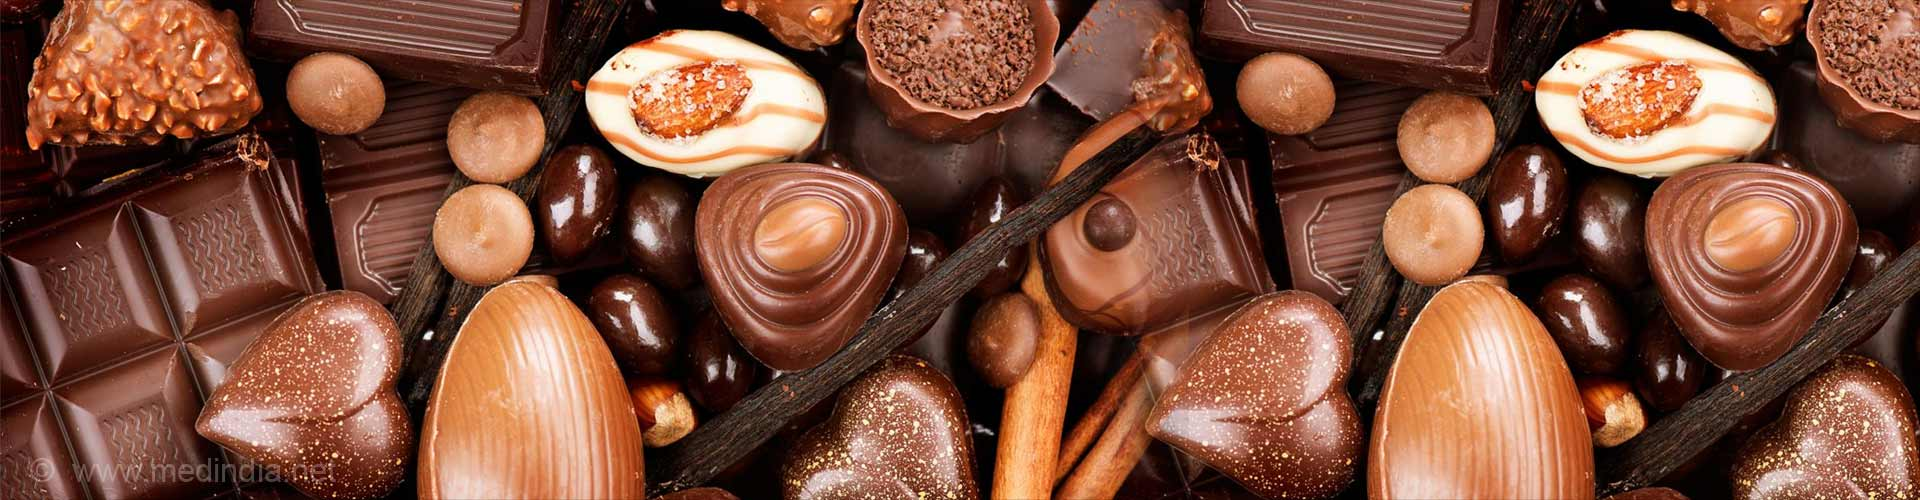 Know Chocolates Better